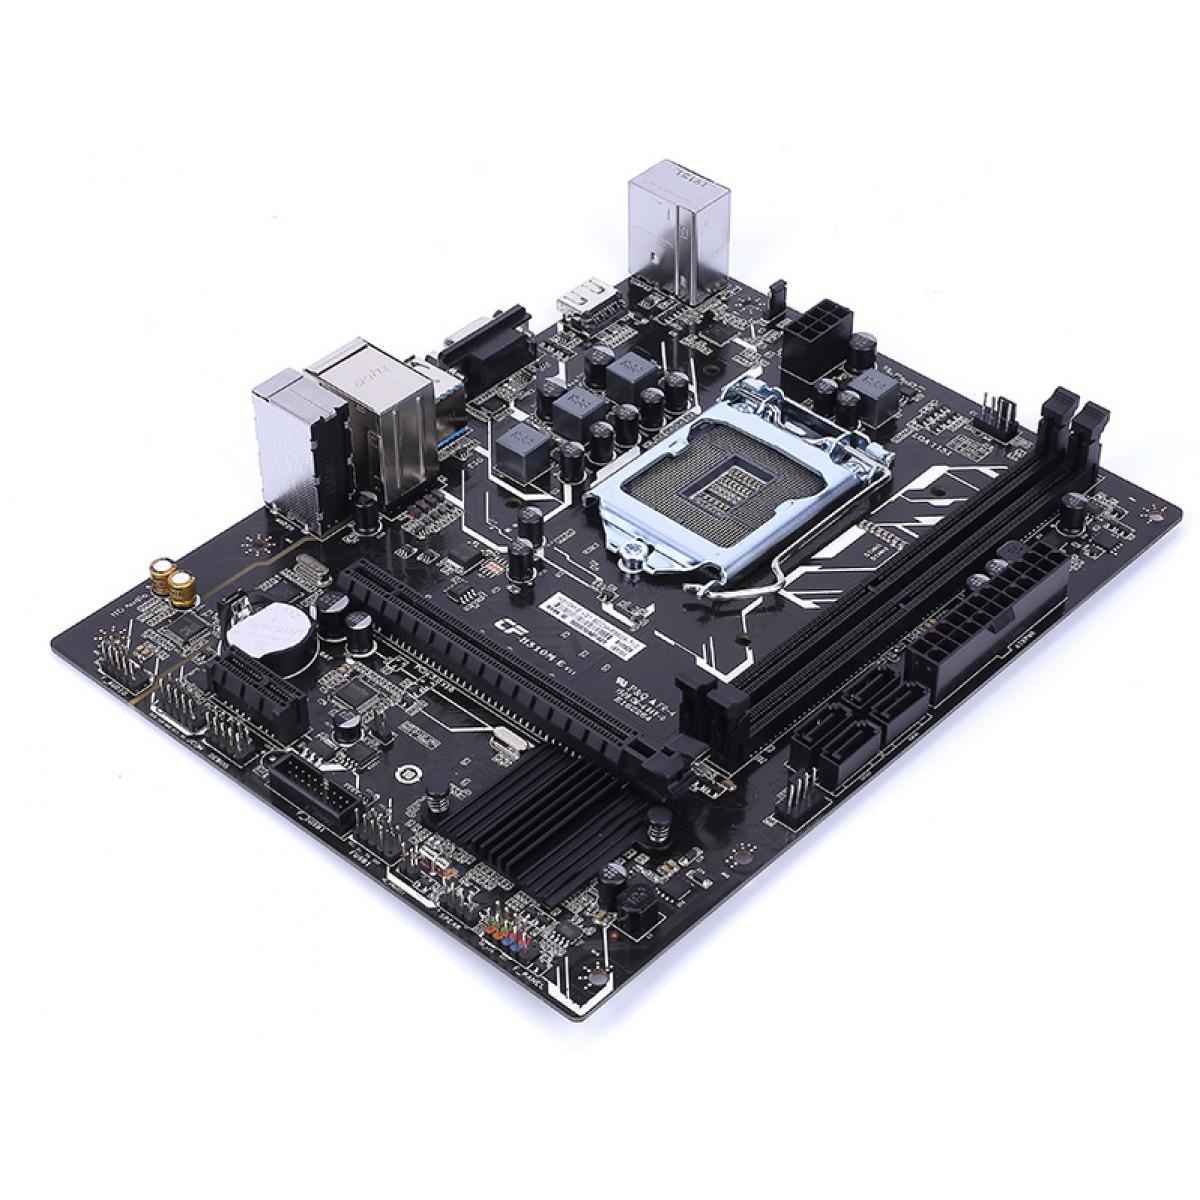 Placa Mãe Colorful H310M-E V21, Chipset H310, Intel LGA 1151, mATX, DDR4